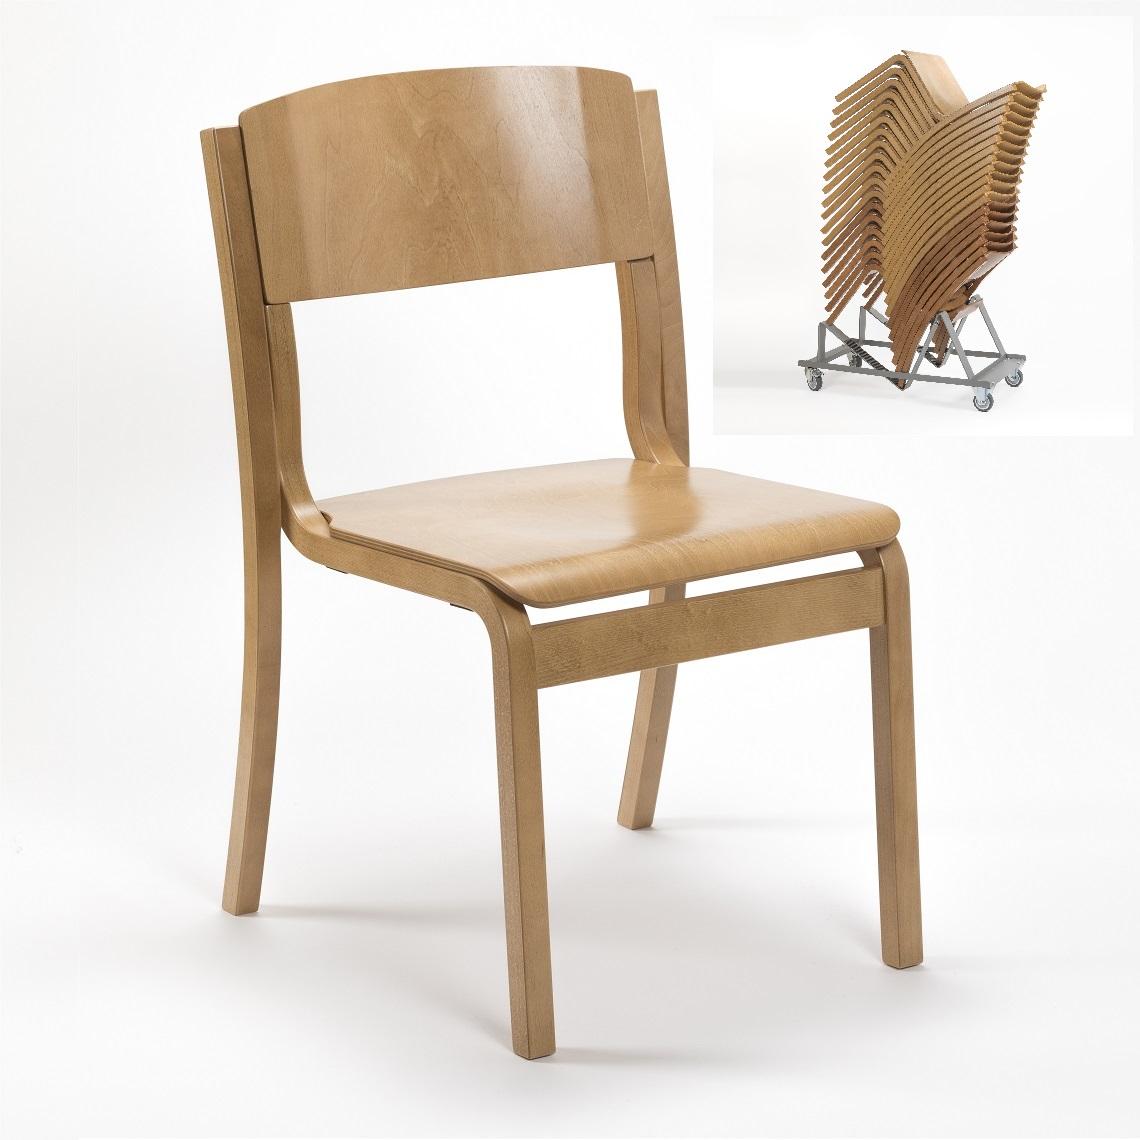 Jacob Lightweight Wooden High Stacking Chair